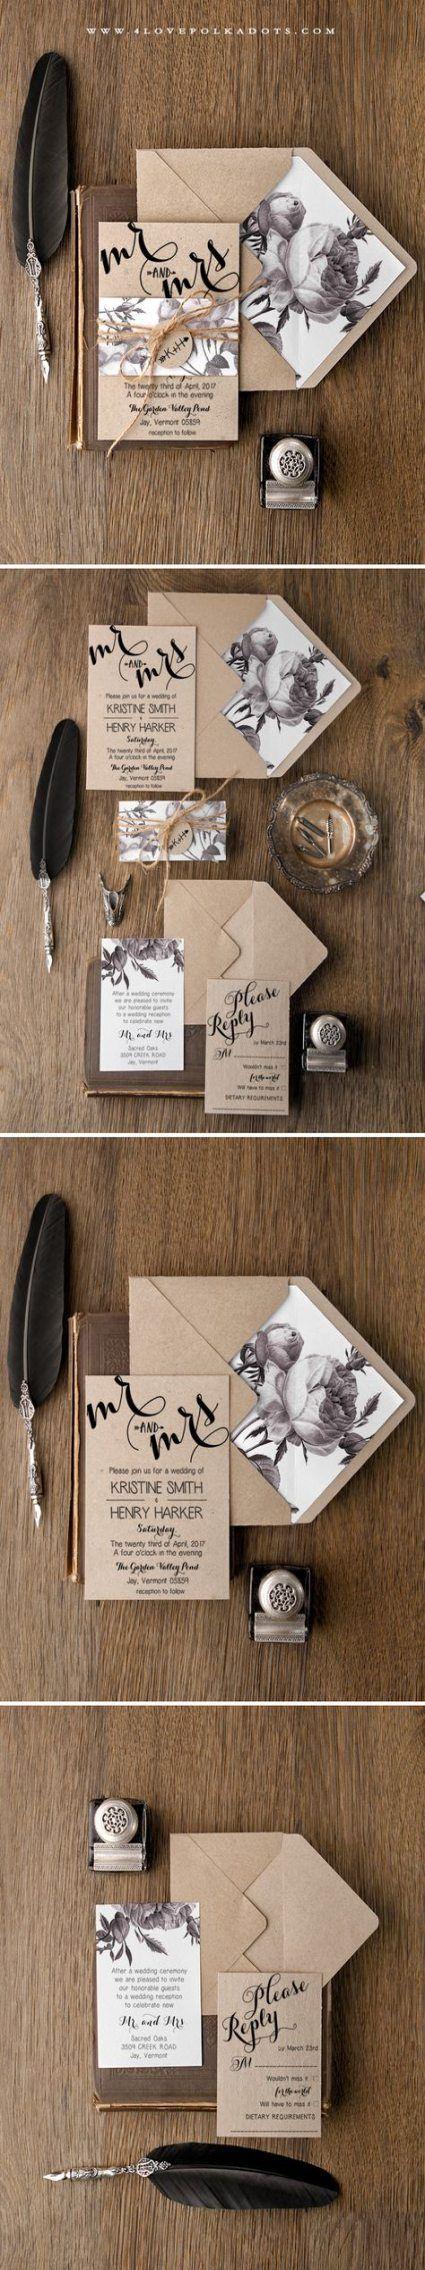 Wedding invitations rustic cricut 57+ Trendy Ideas